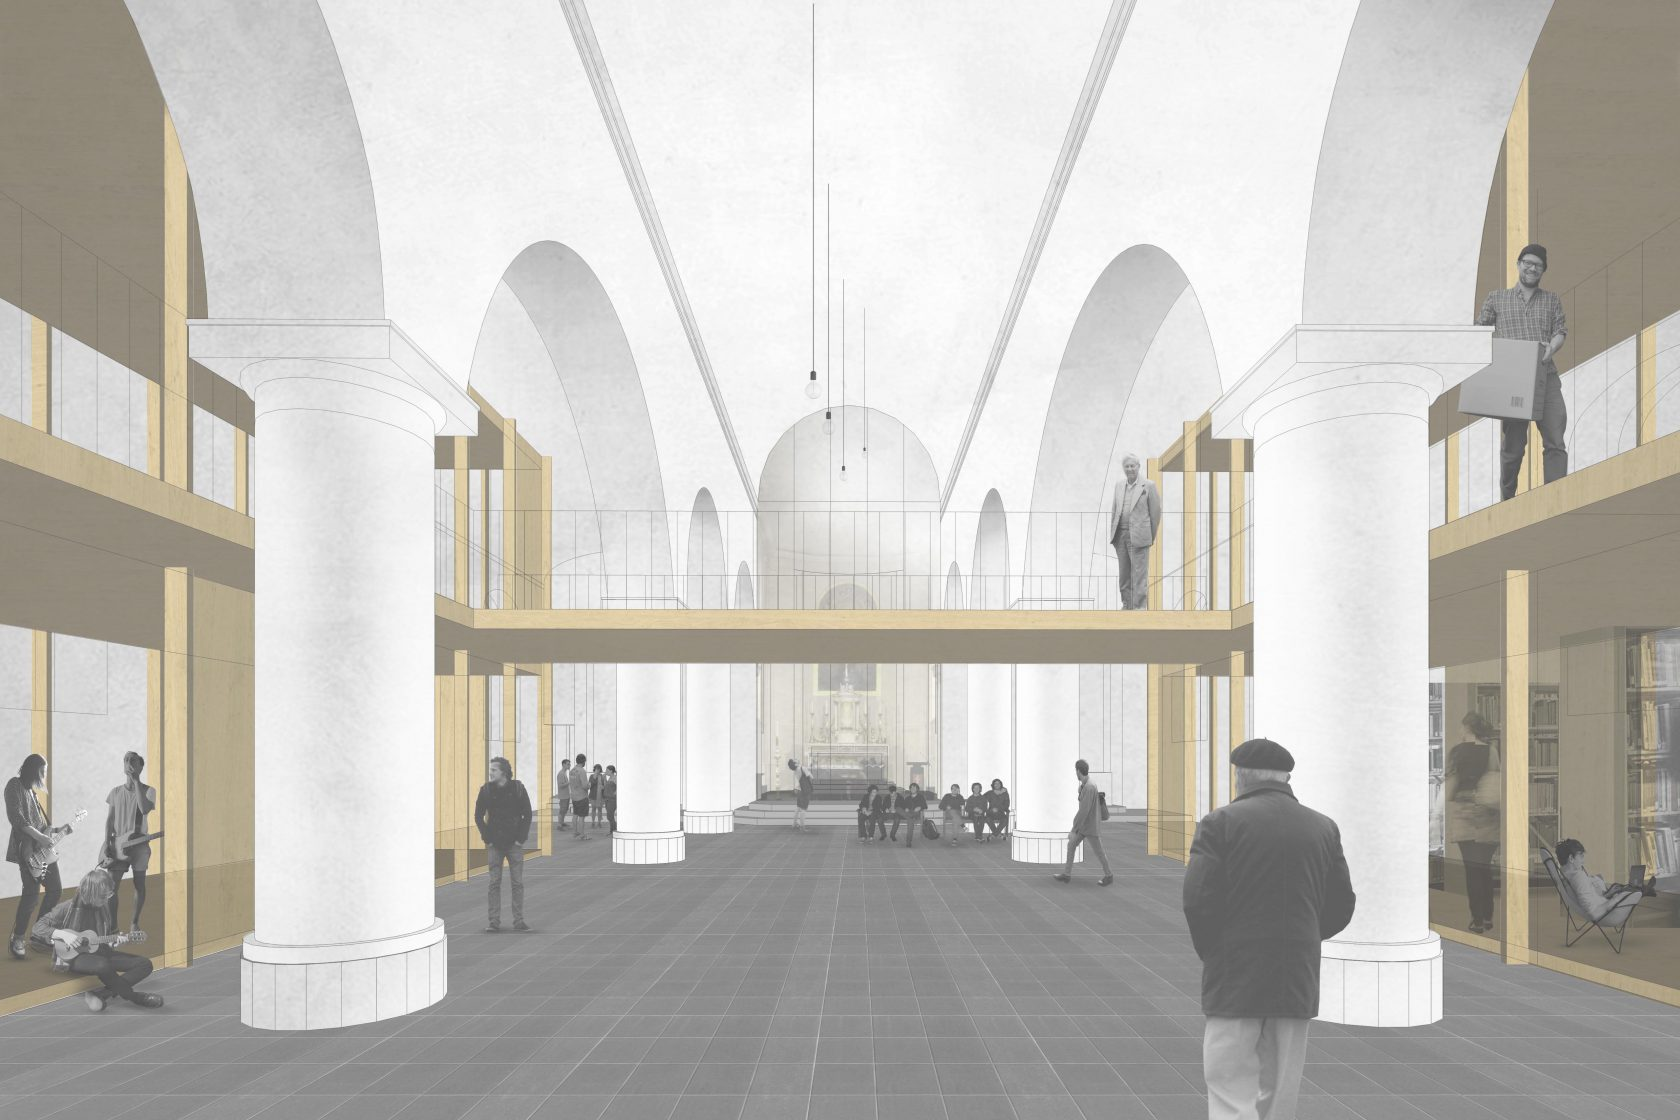 BCQ architecten & ARC - sfeerbeeld kerk 01 Aalbeke